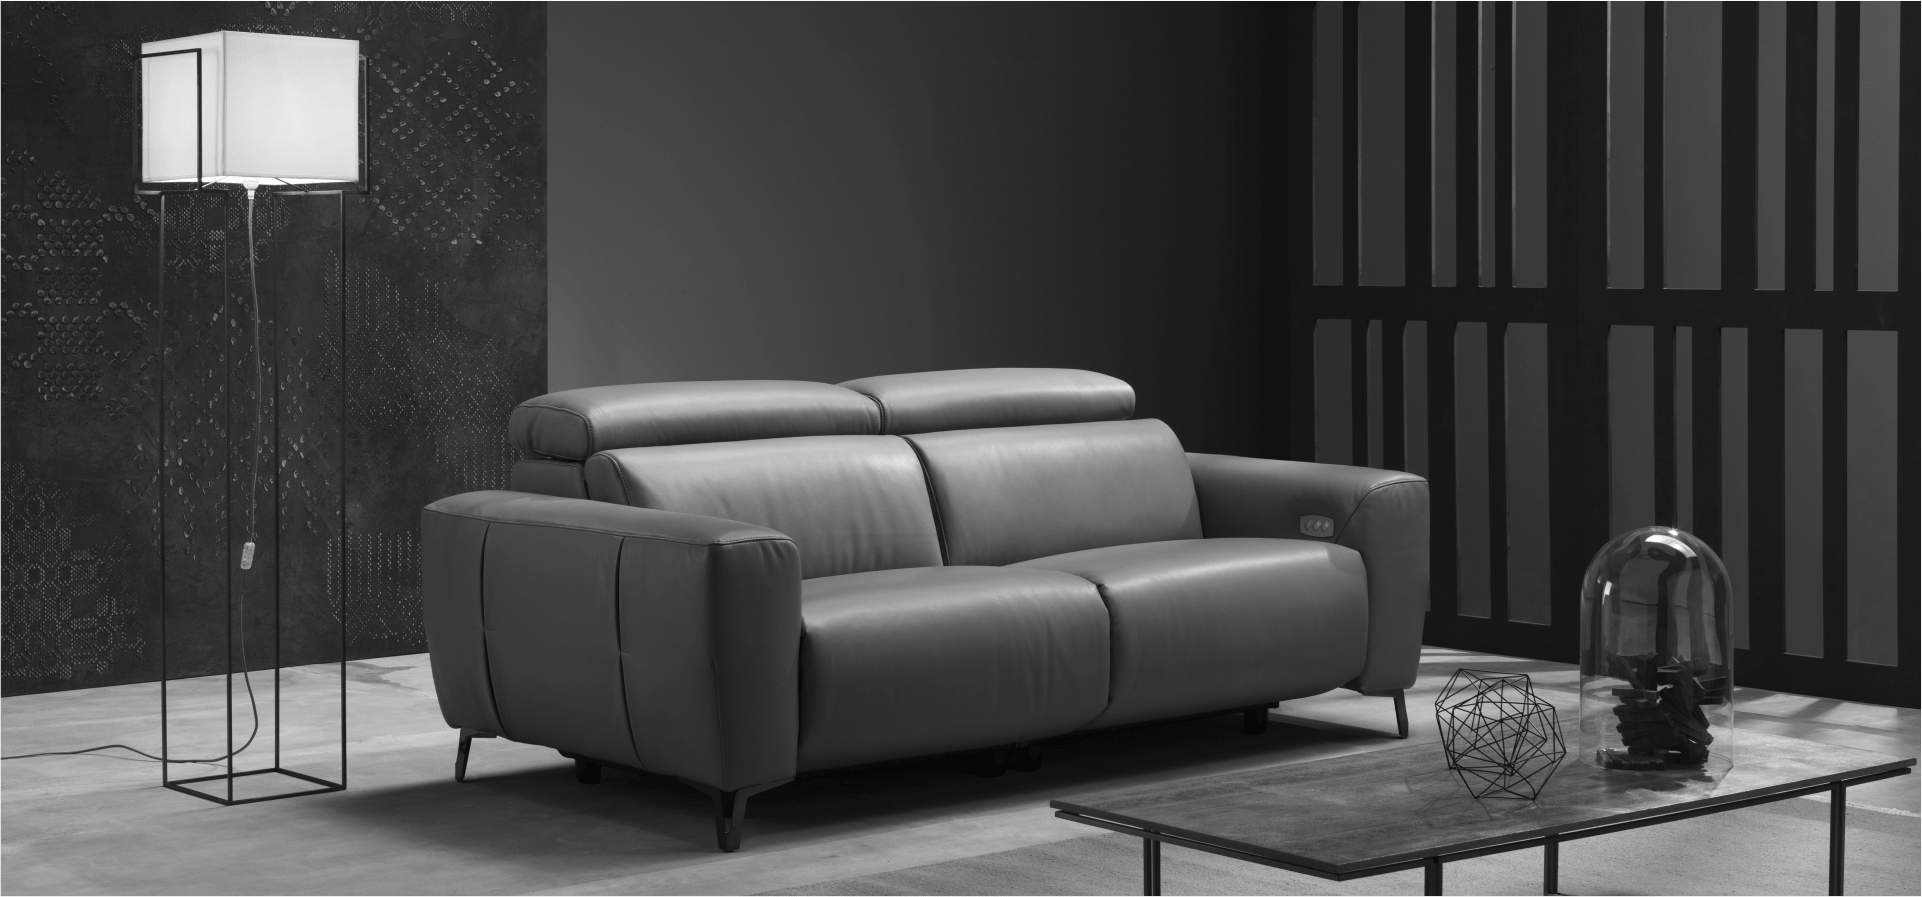 Italian Furniture In Hyderabad Contemporary Sofa Set Italian Sofa Sofa Set